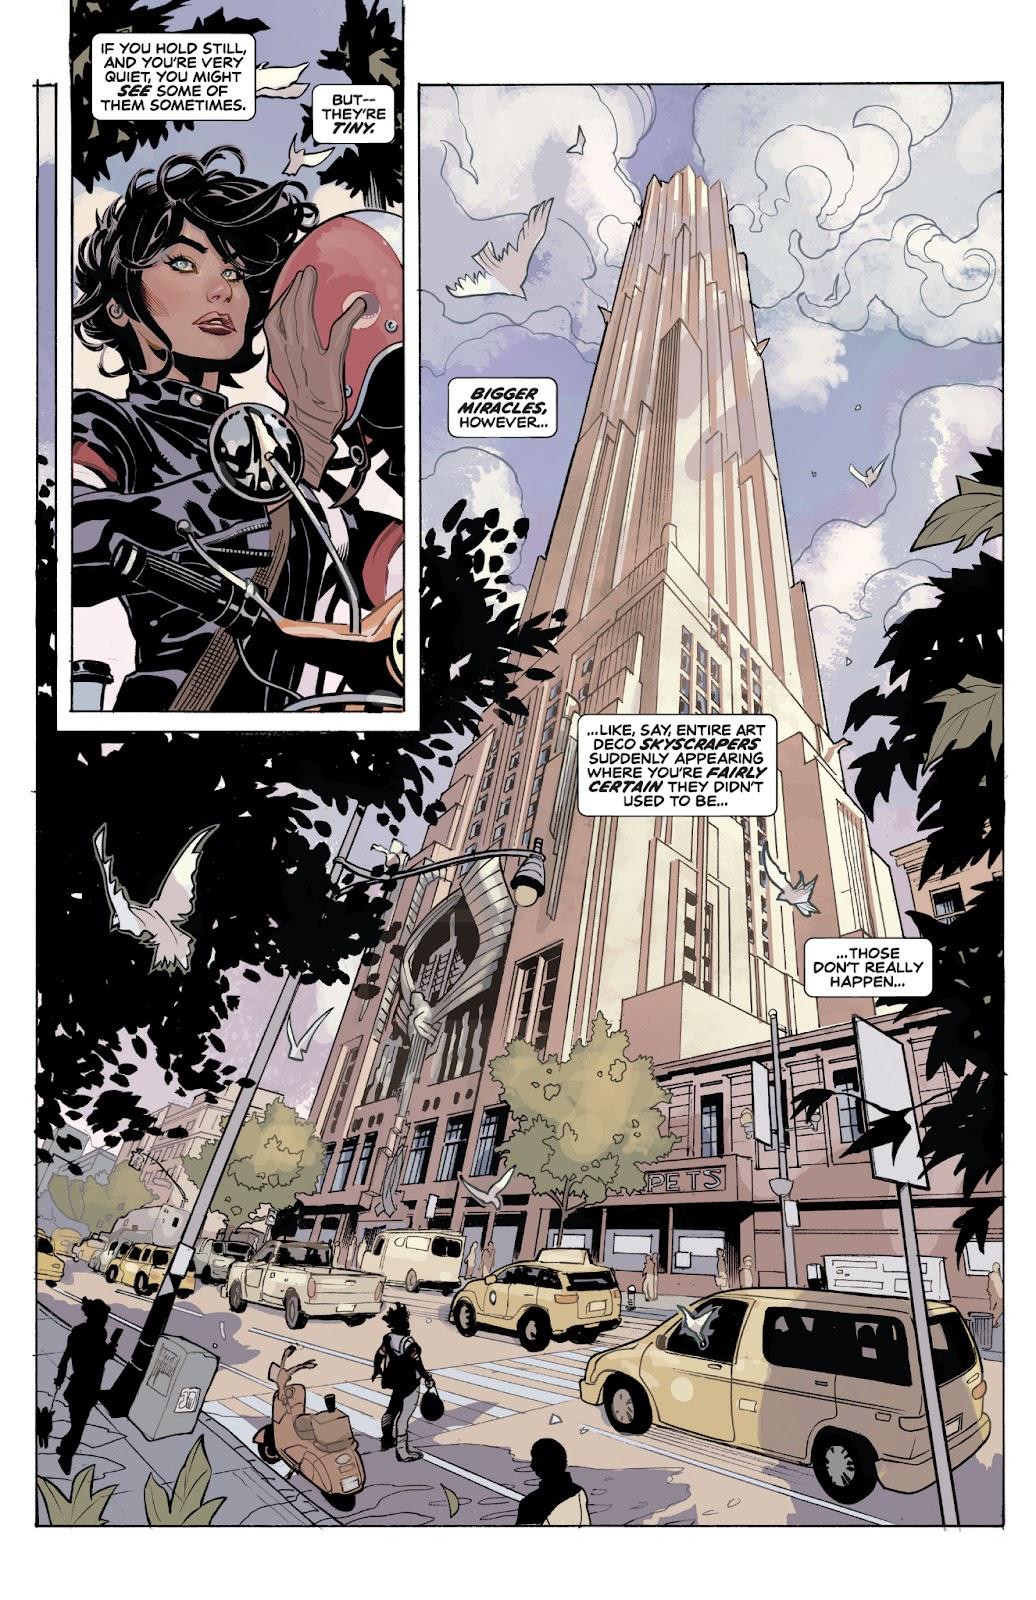 They Built This City: Delving into Matt Fraction's 'Adventureman'